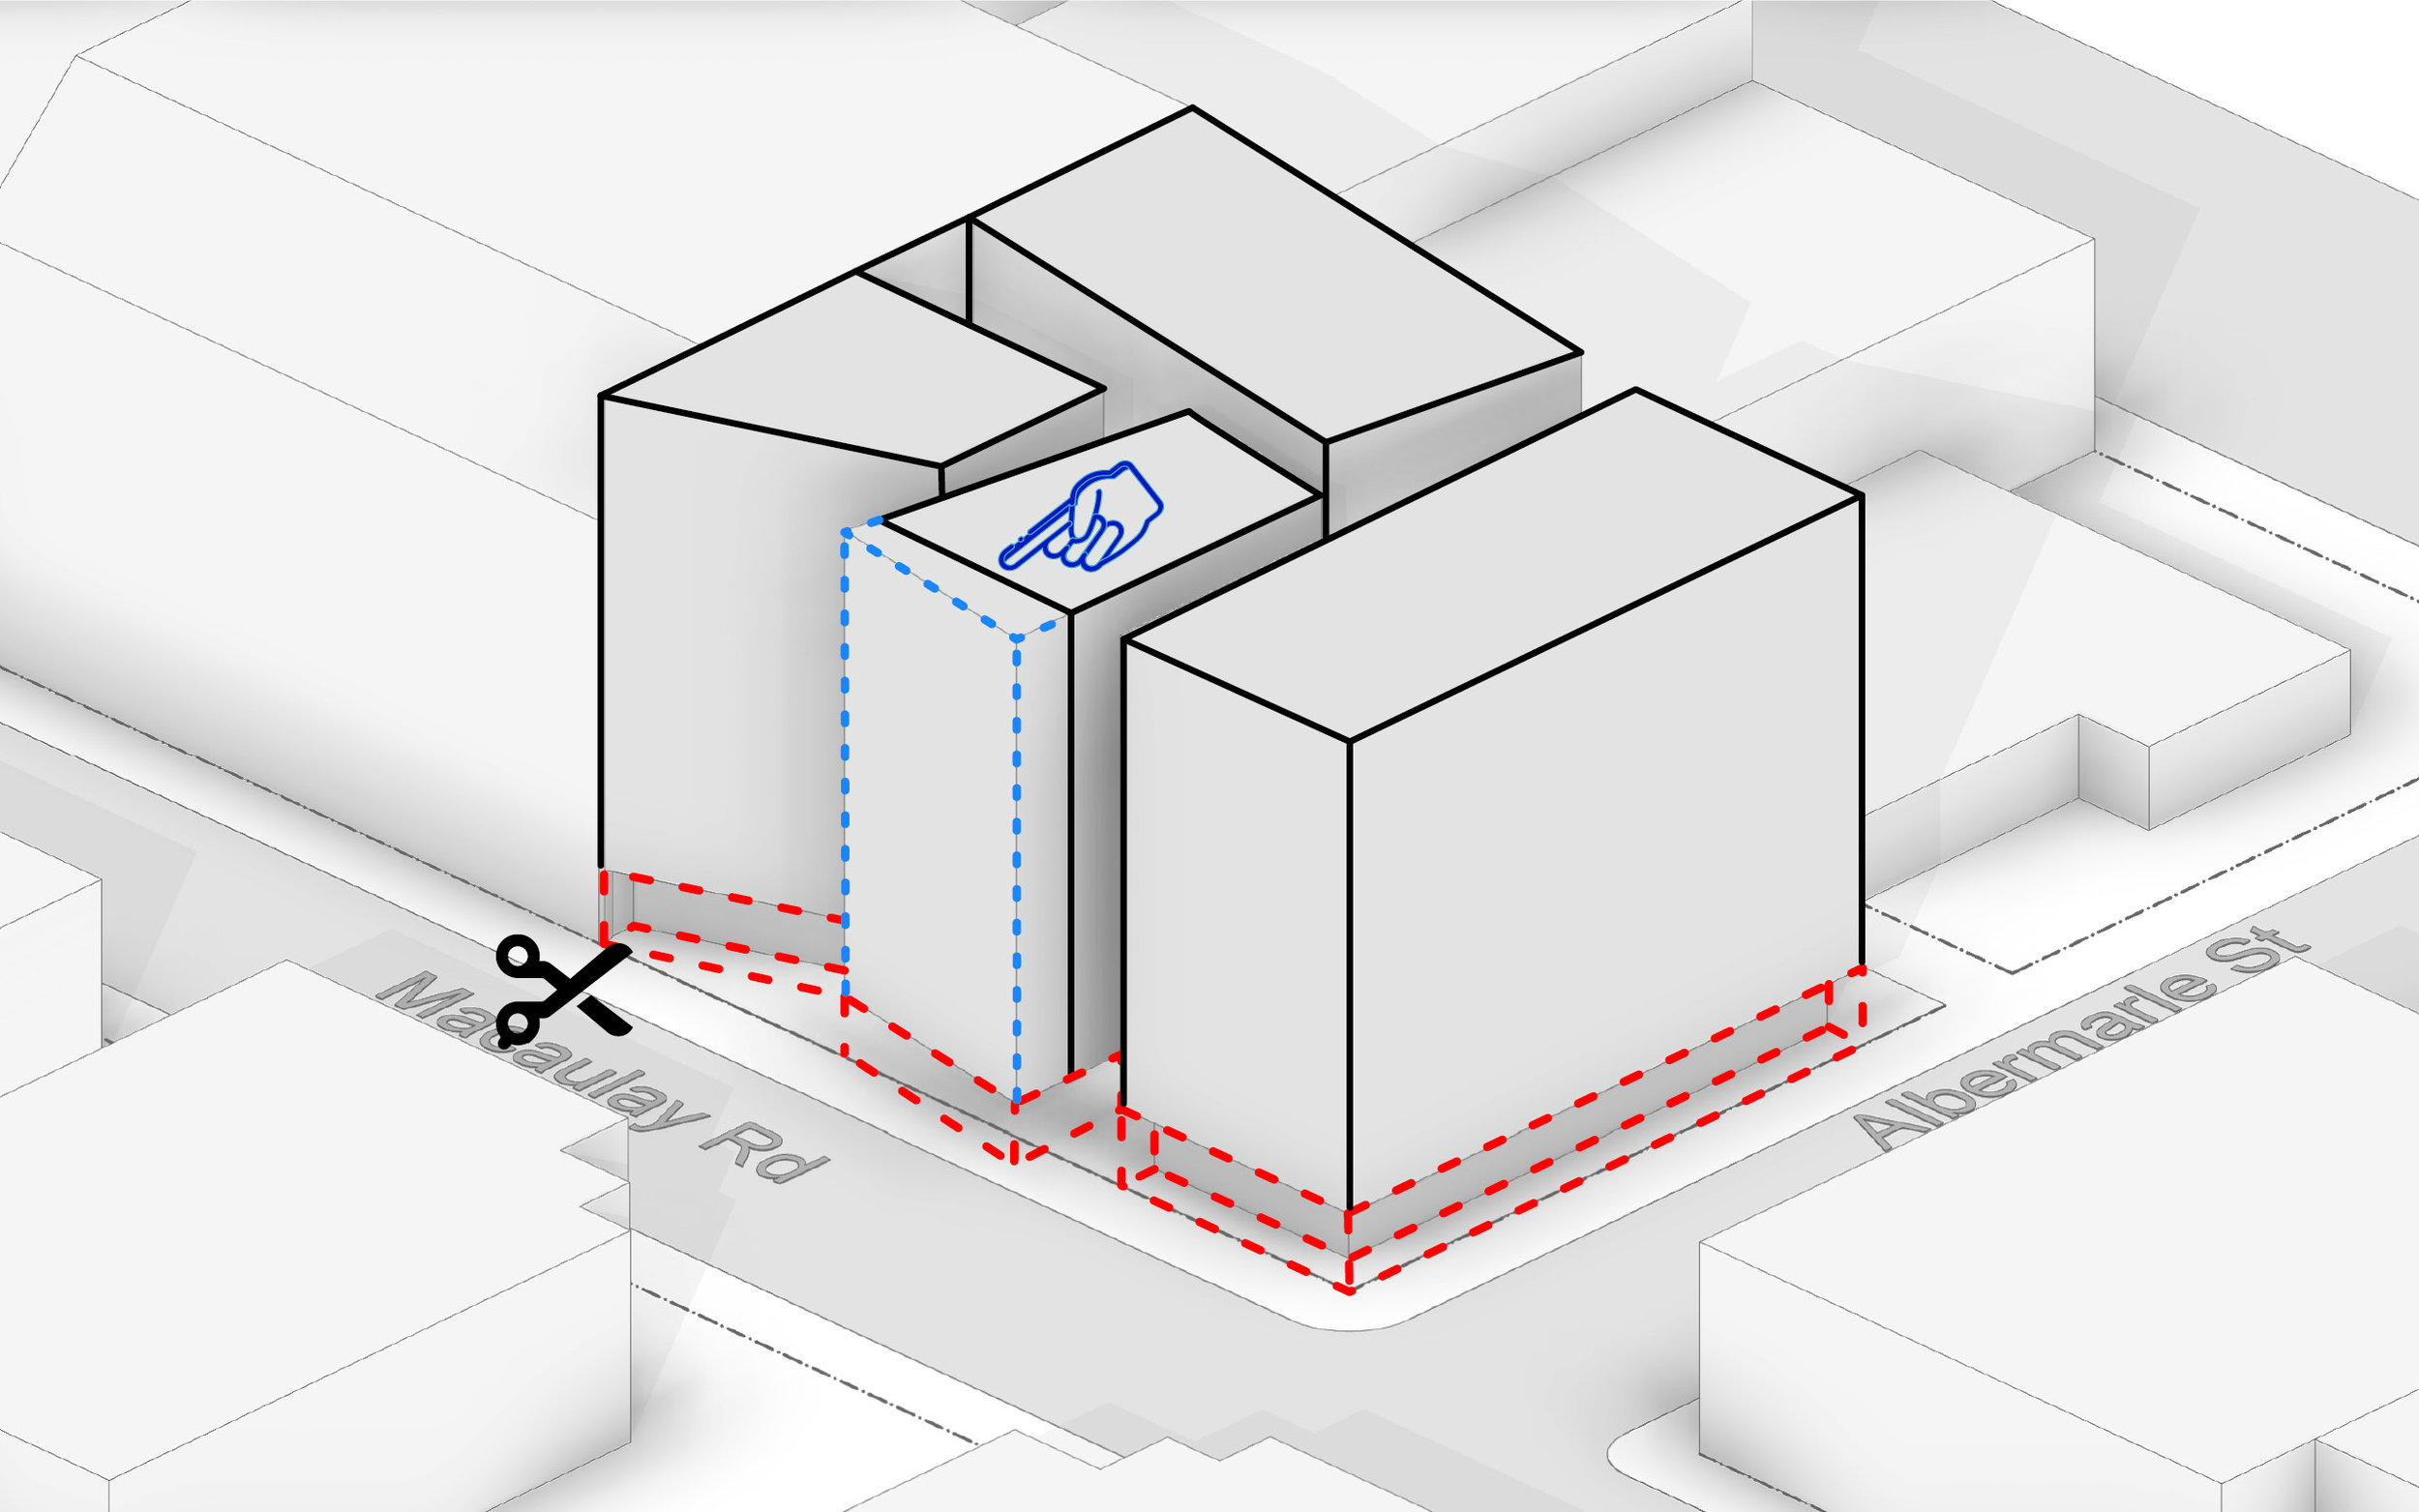 Extend Spine Block onto street interface